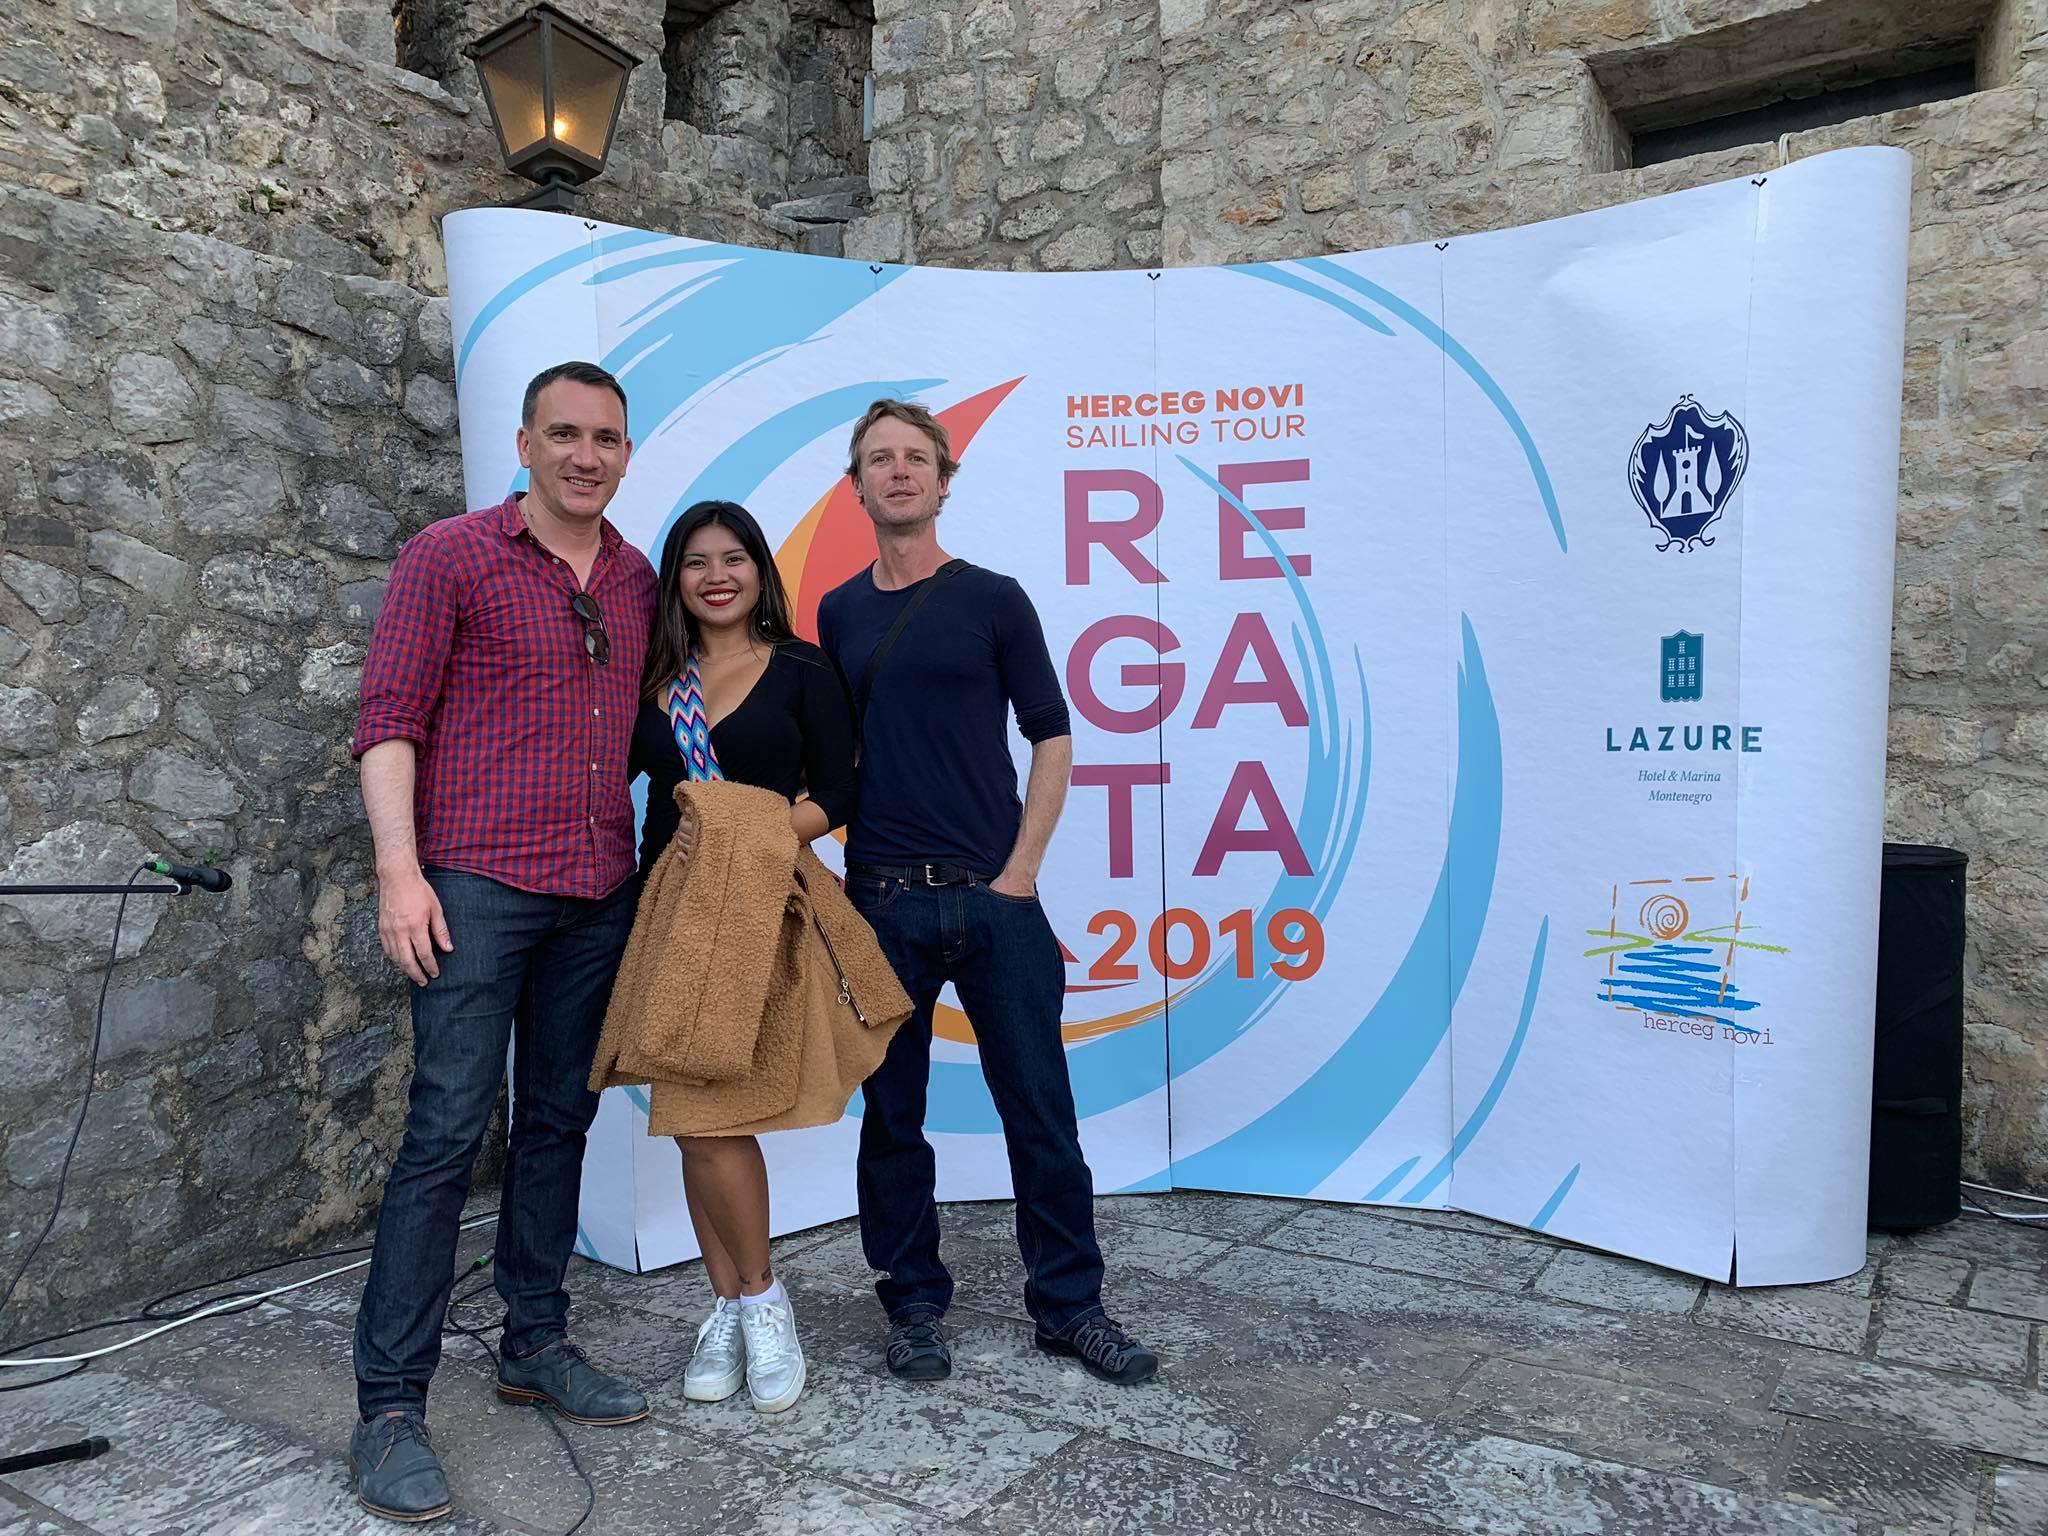 Expat Life in Montenegro Day 2 First full day in Herceg Novi15.jpg